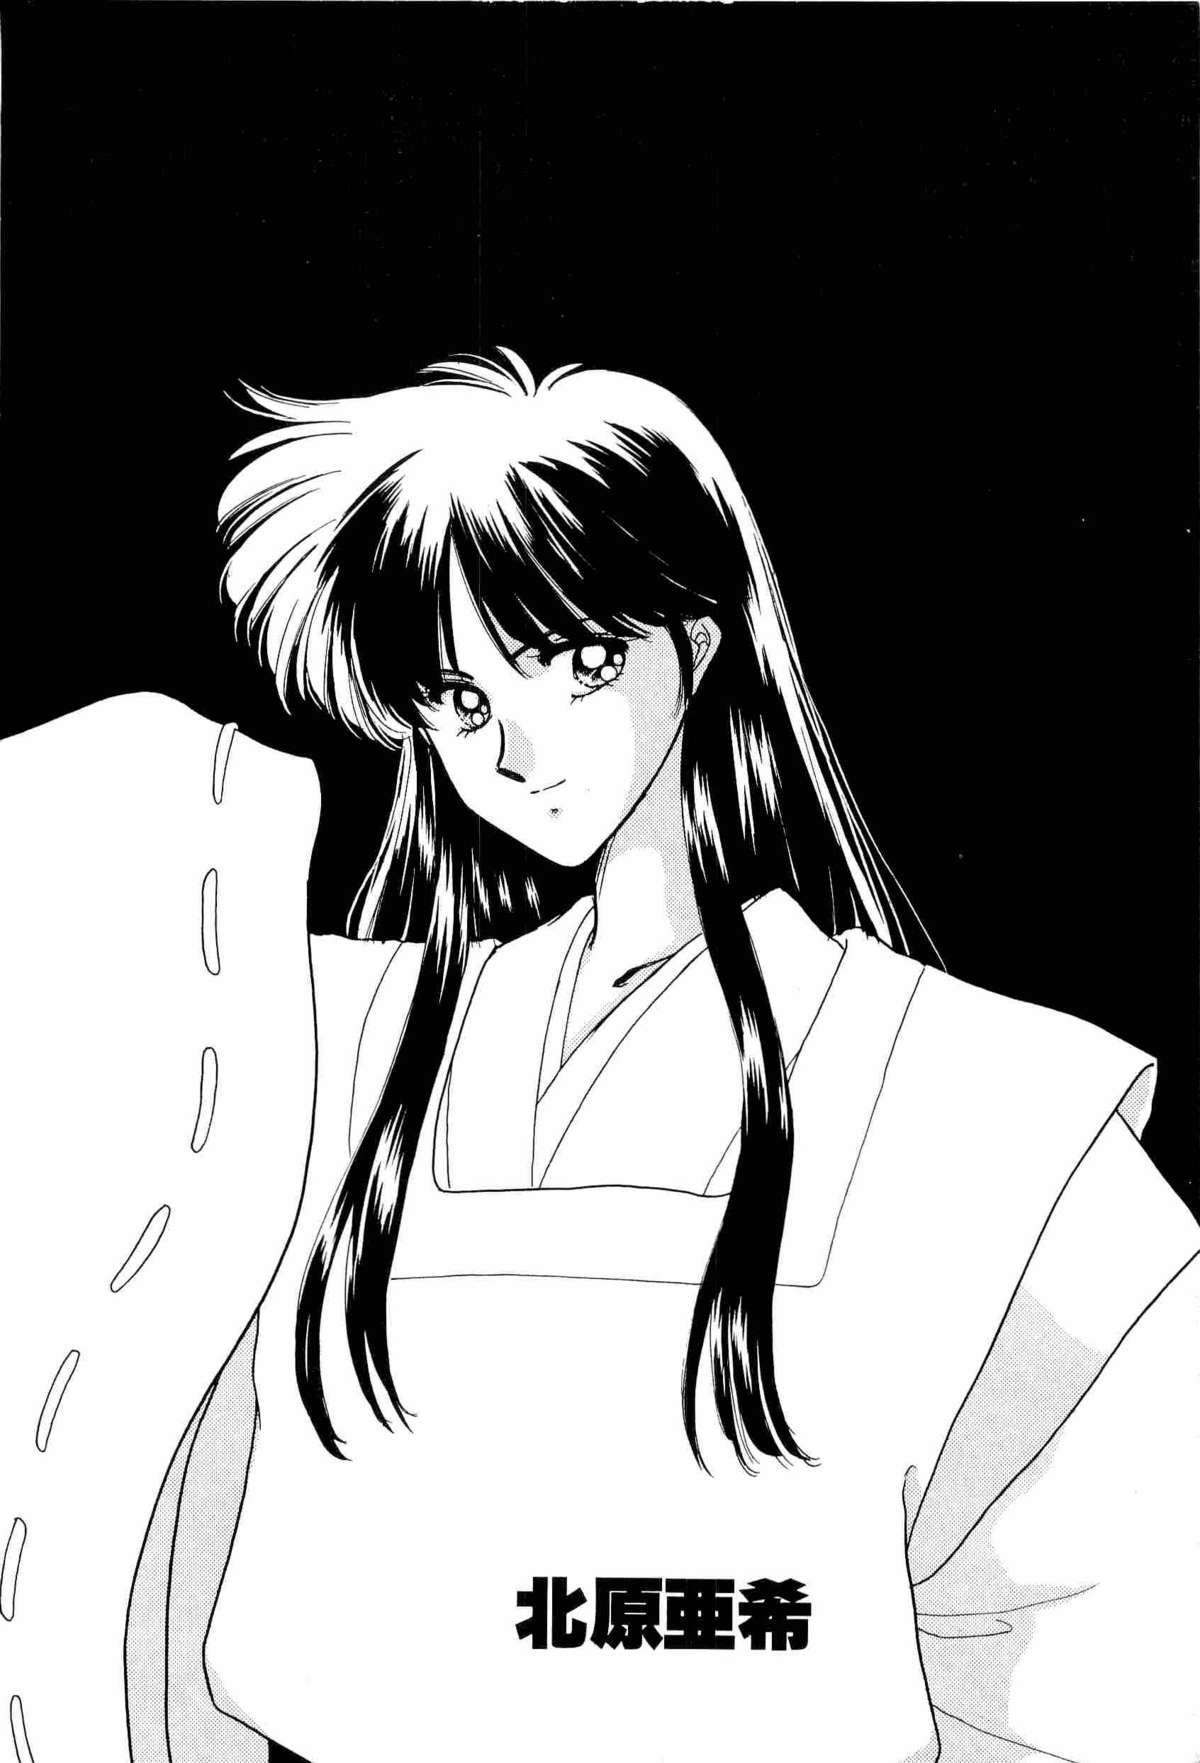 Bisyoujo Anthology '93 jyoukan 4